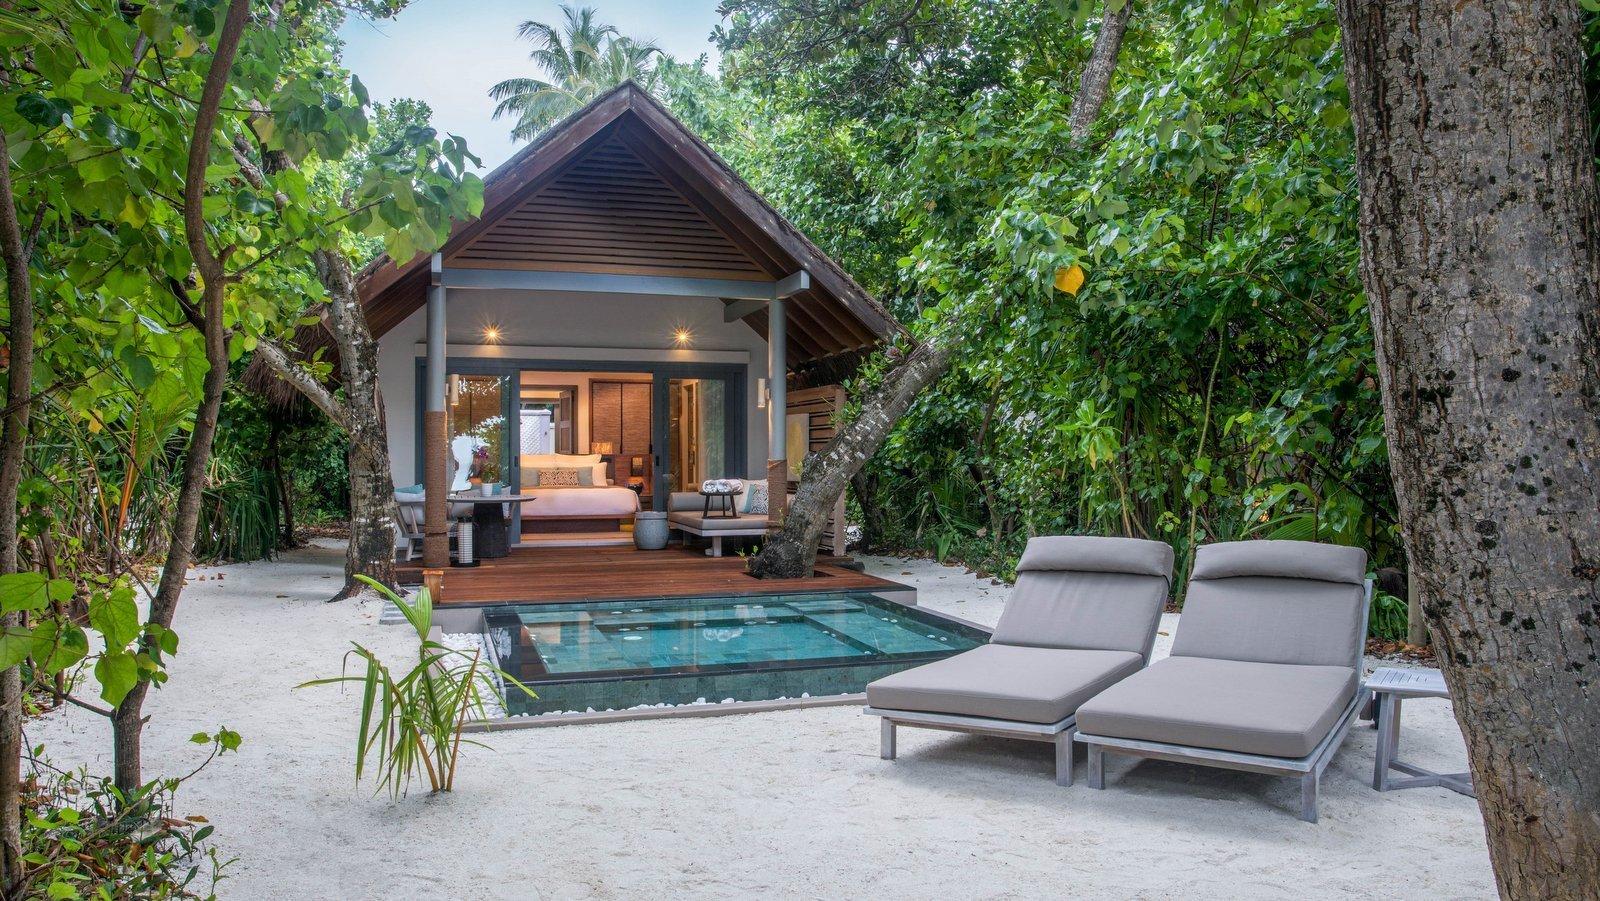 Мальдивы, отель Vakkaru Maldives, номер Beach Villa with Plunge Pool